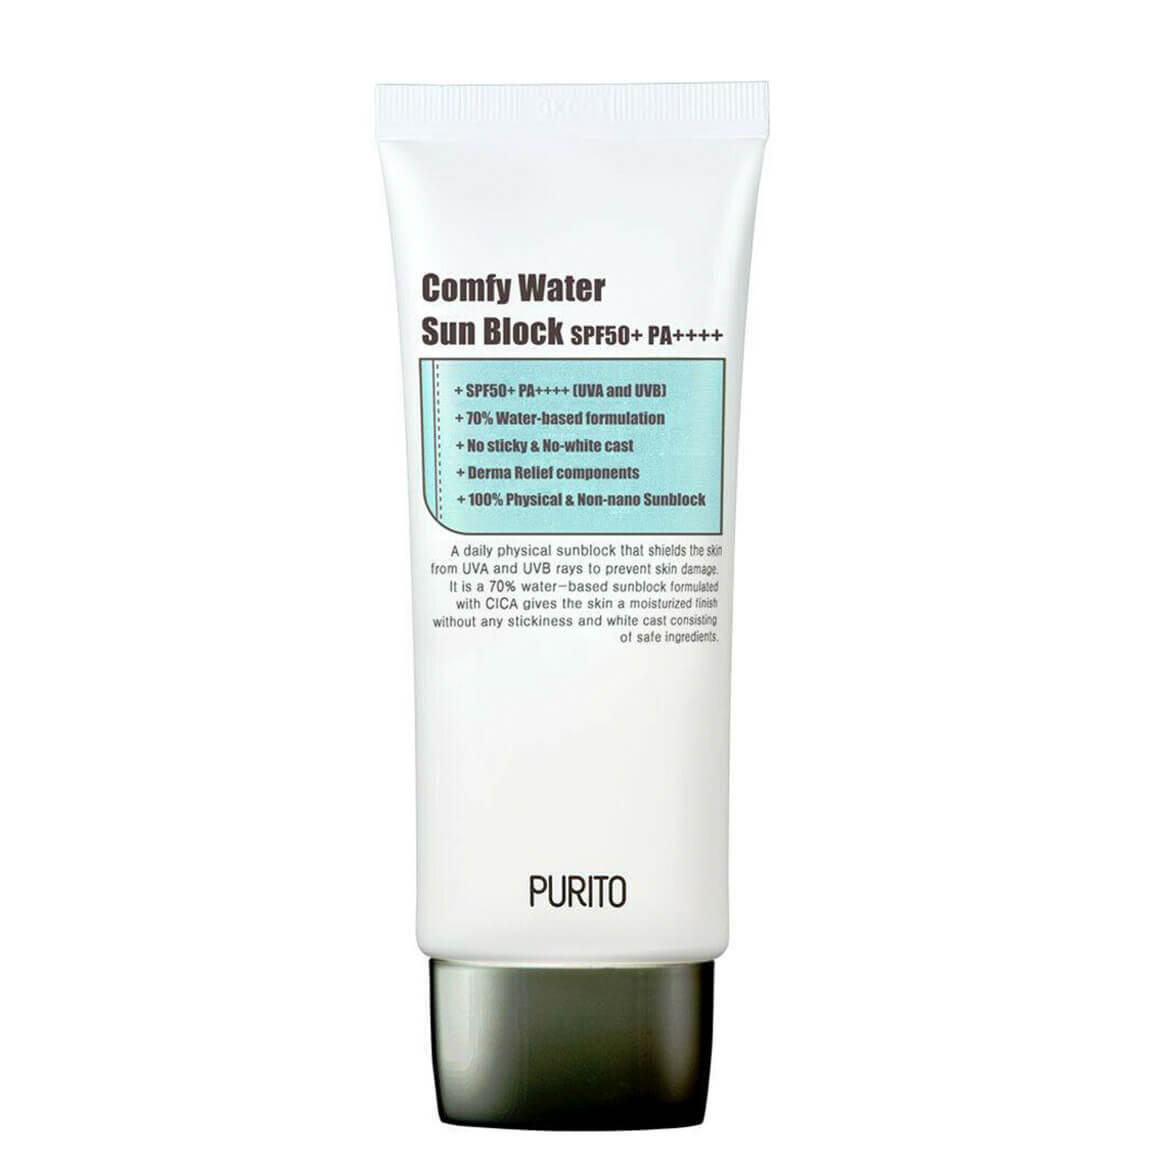 PURITO Comfy Water Sun Block SPF50+ PA++++ 60ml   Beauty Hub